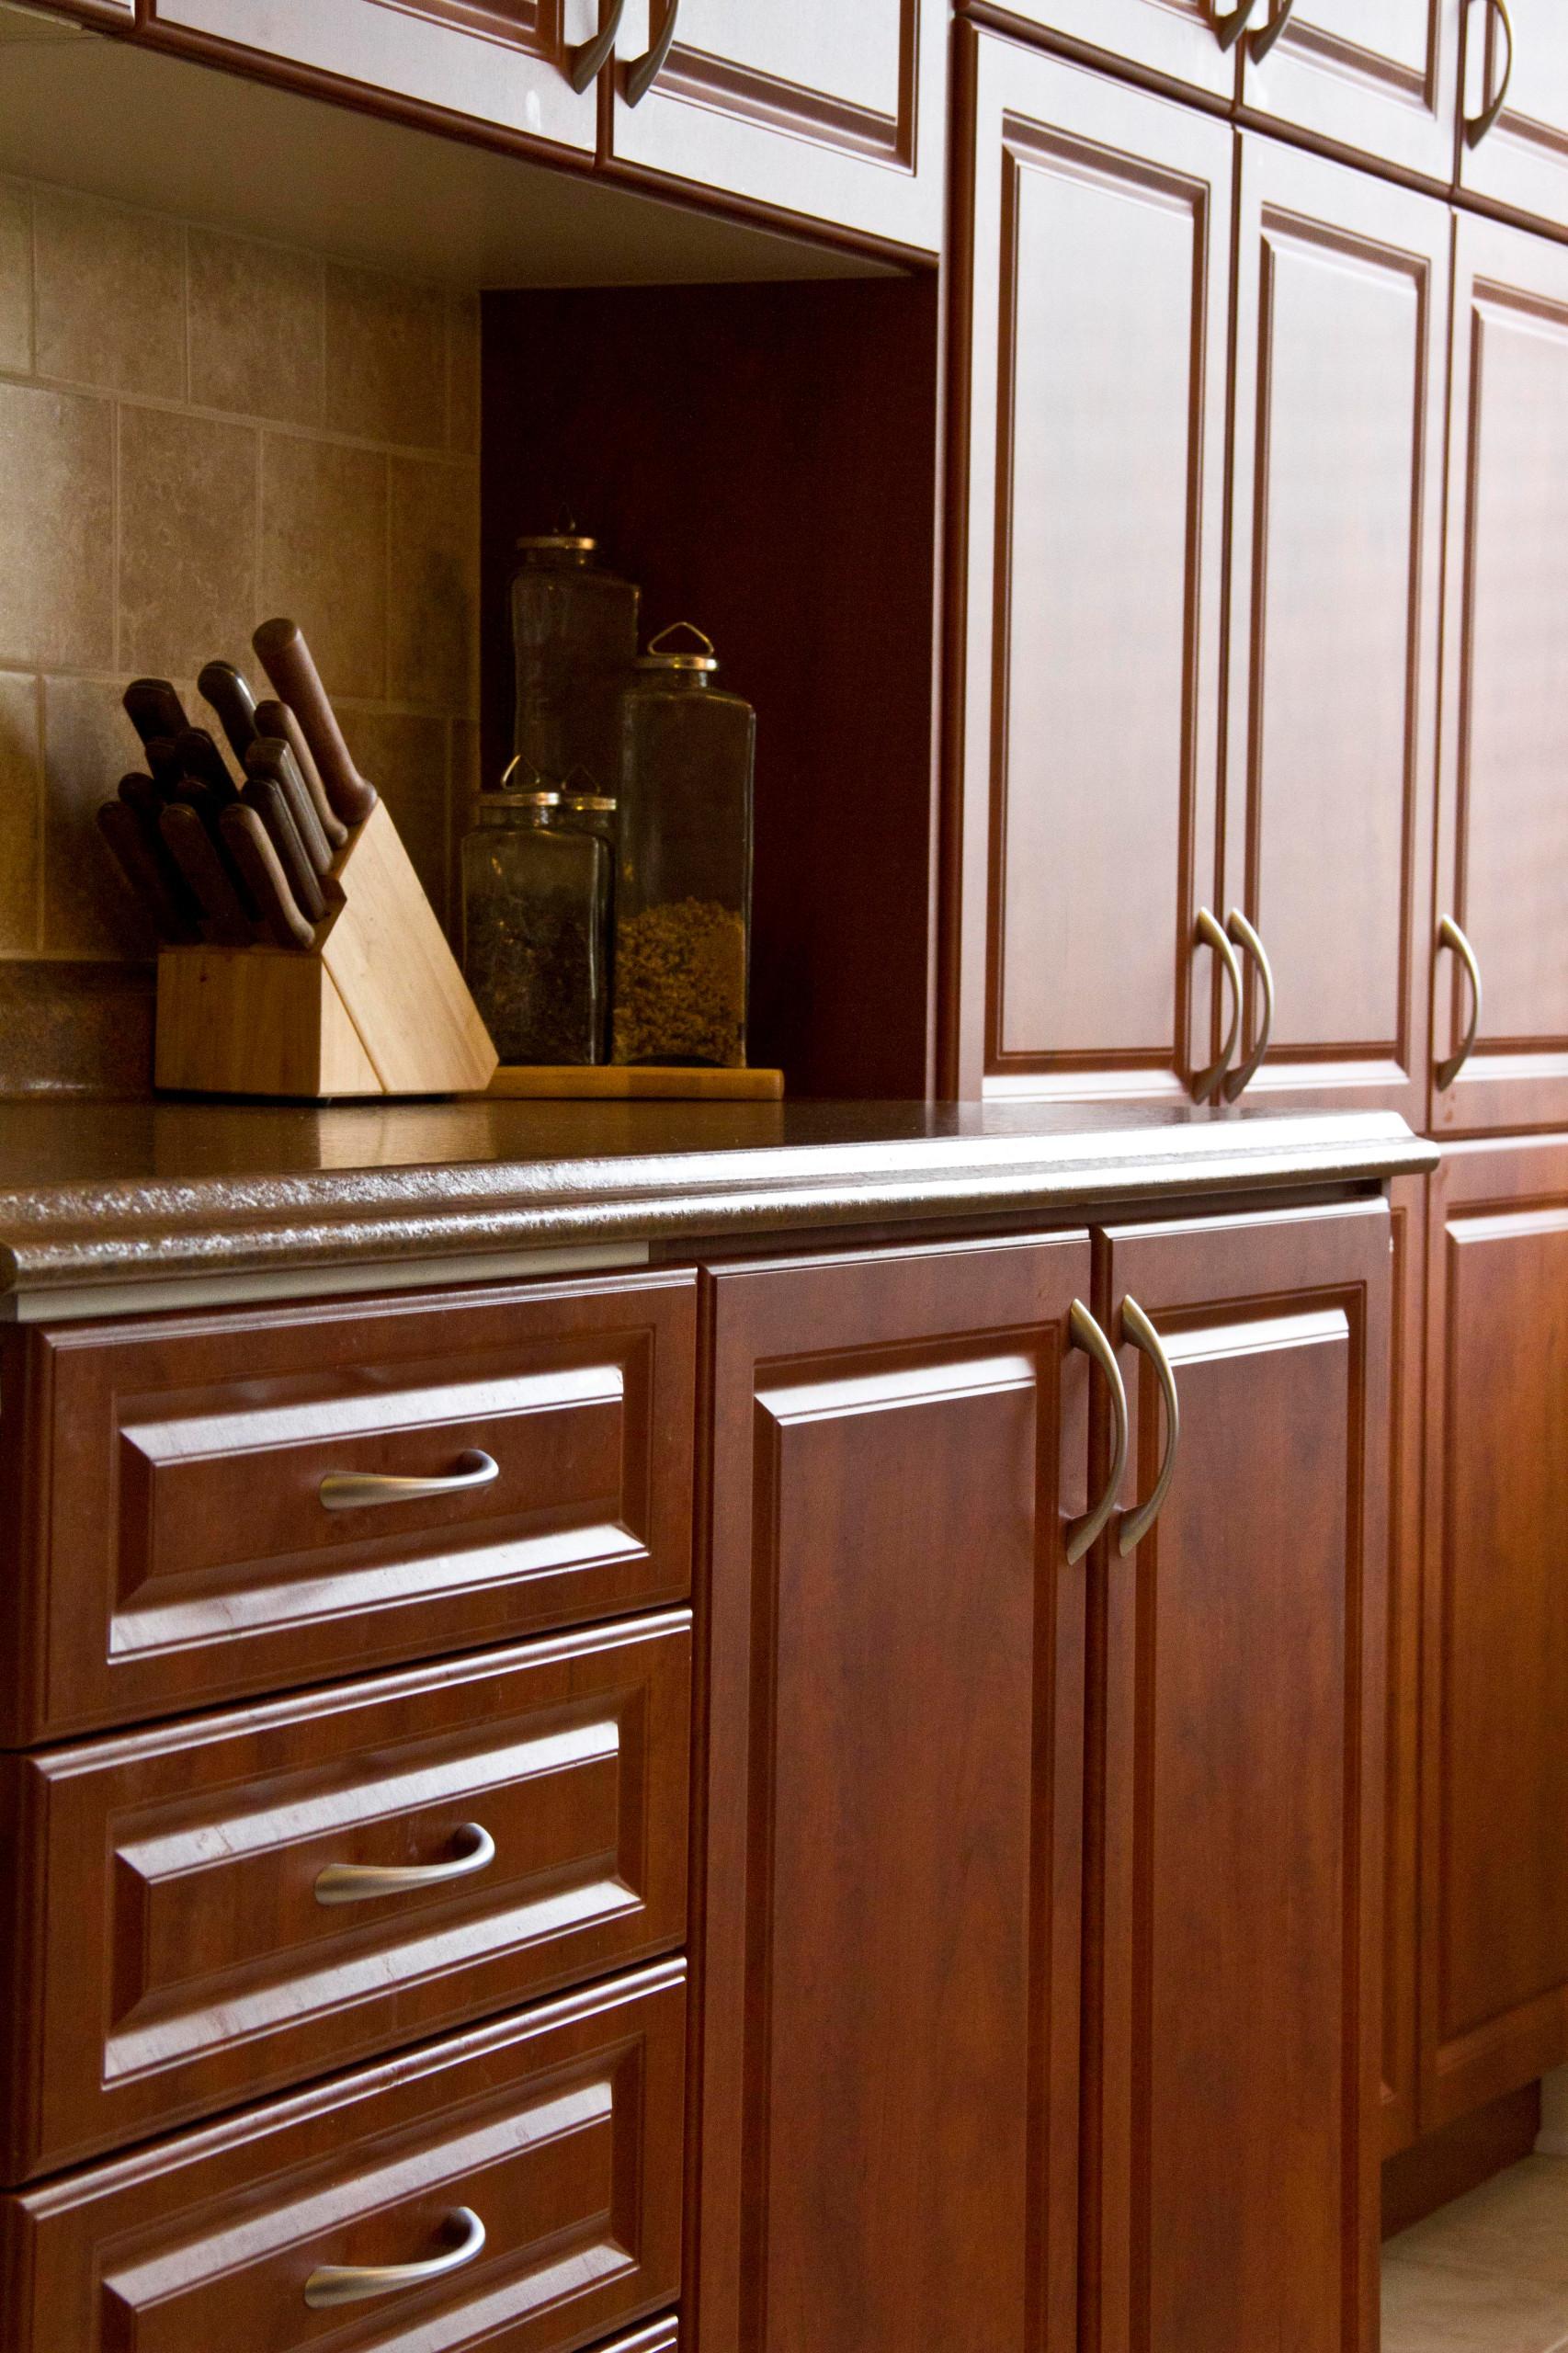 Kitchen Renovation and Addition